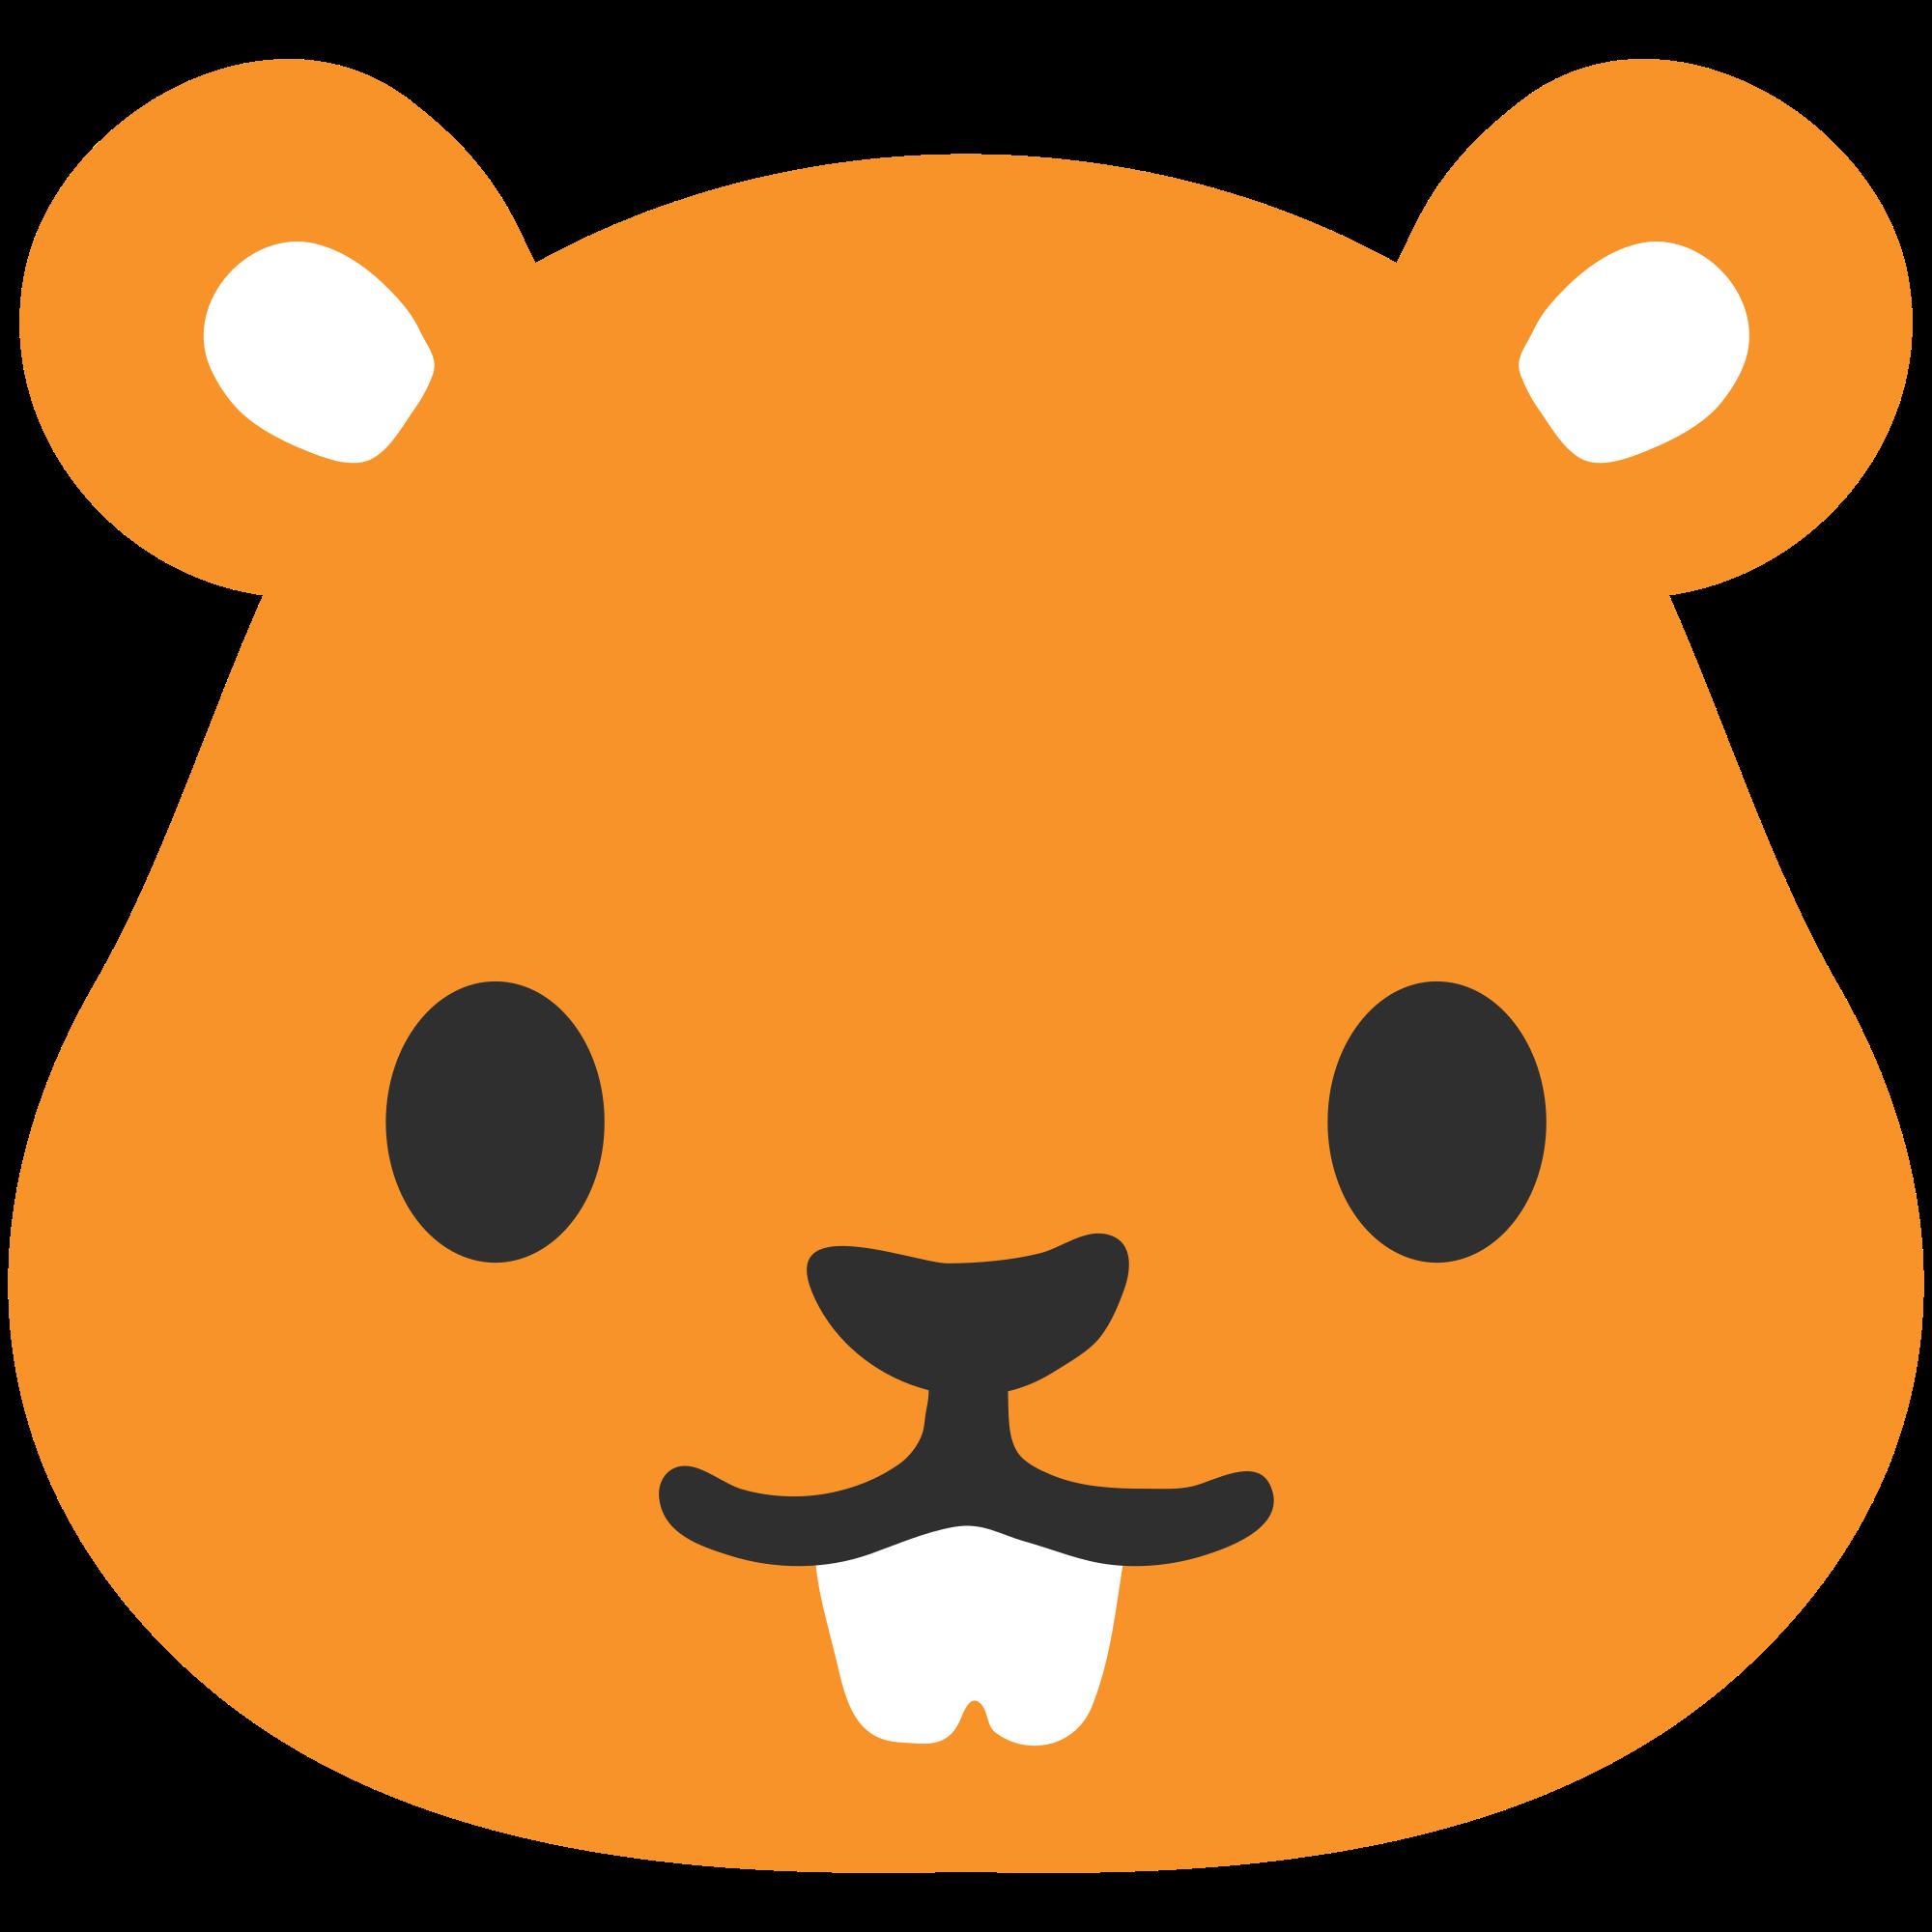 Hamster clipart orange. File emoji u f